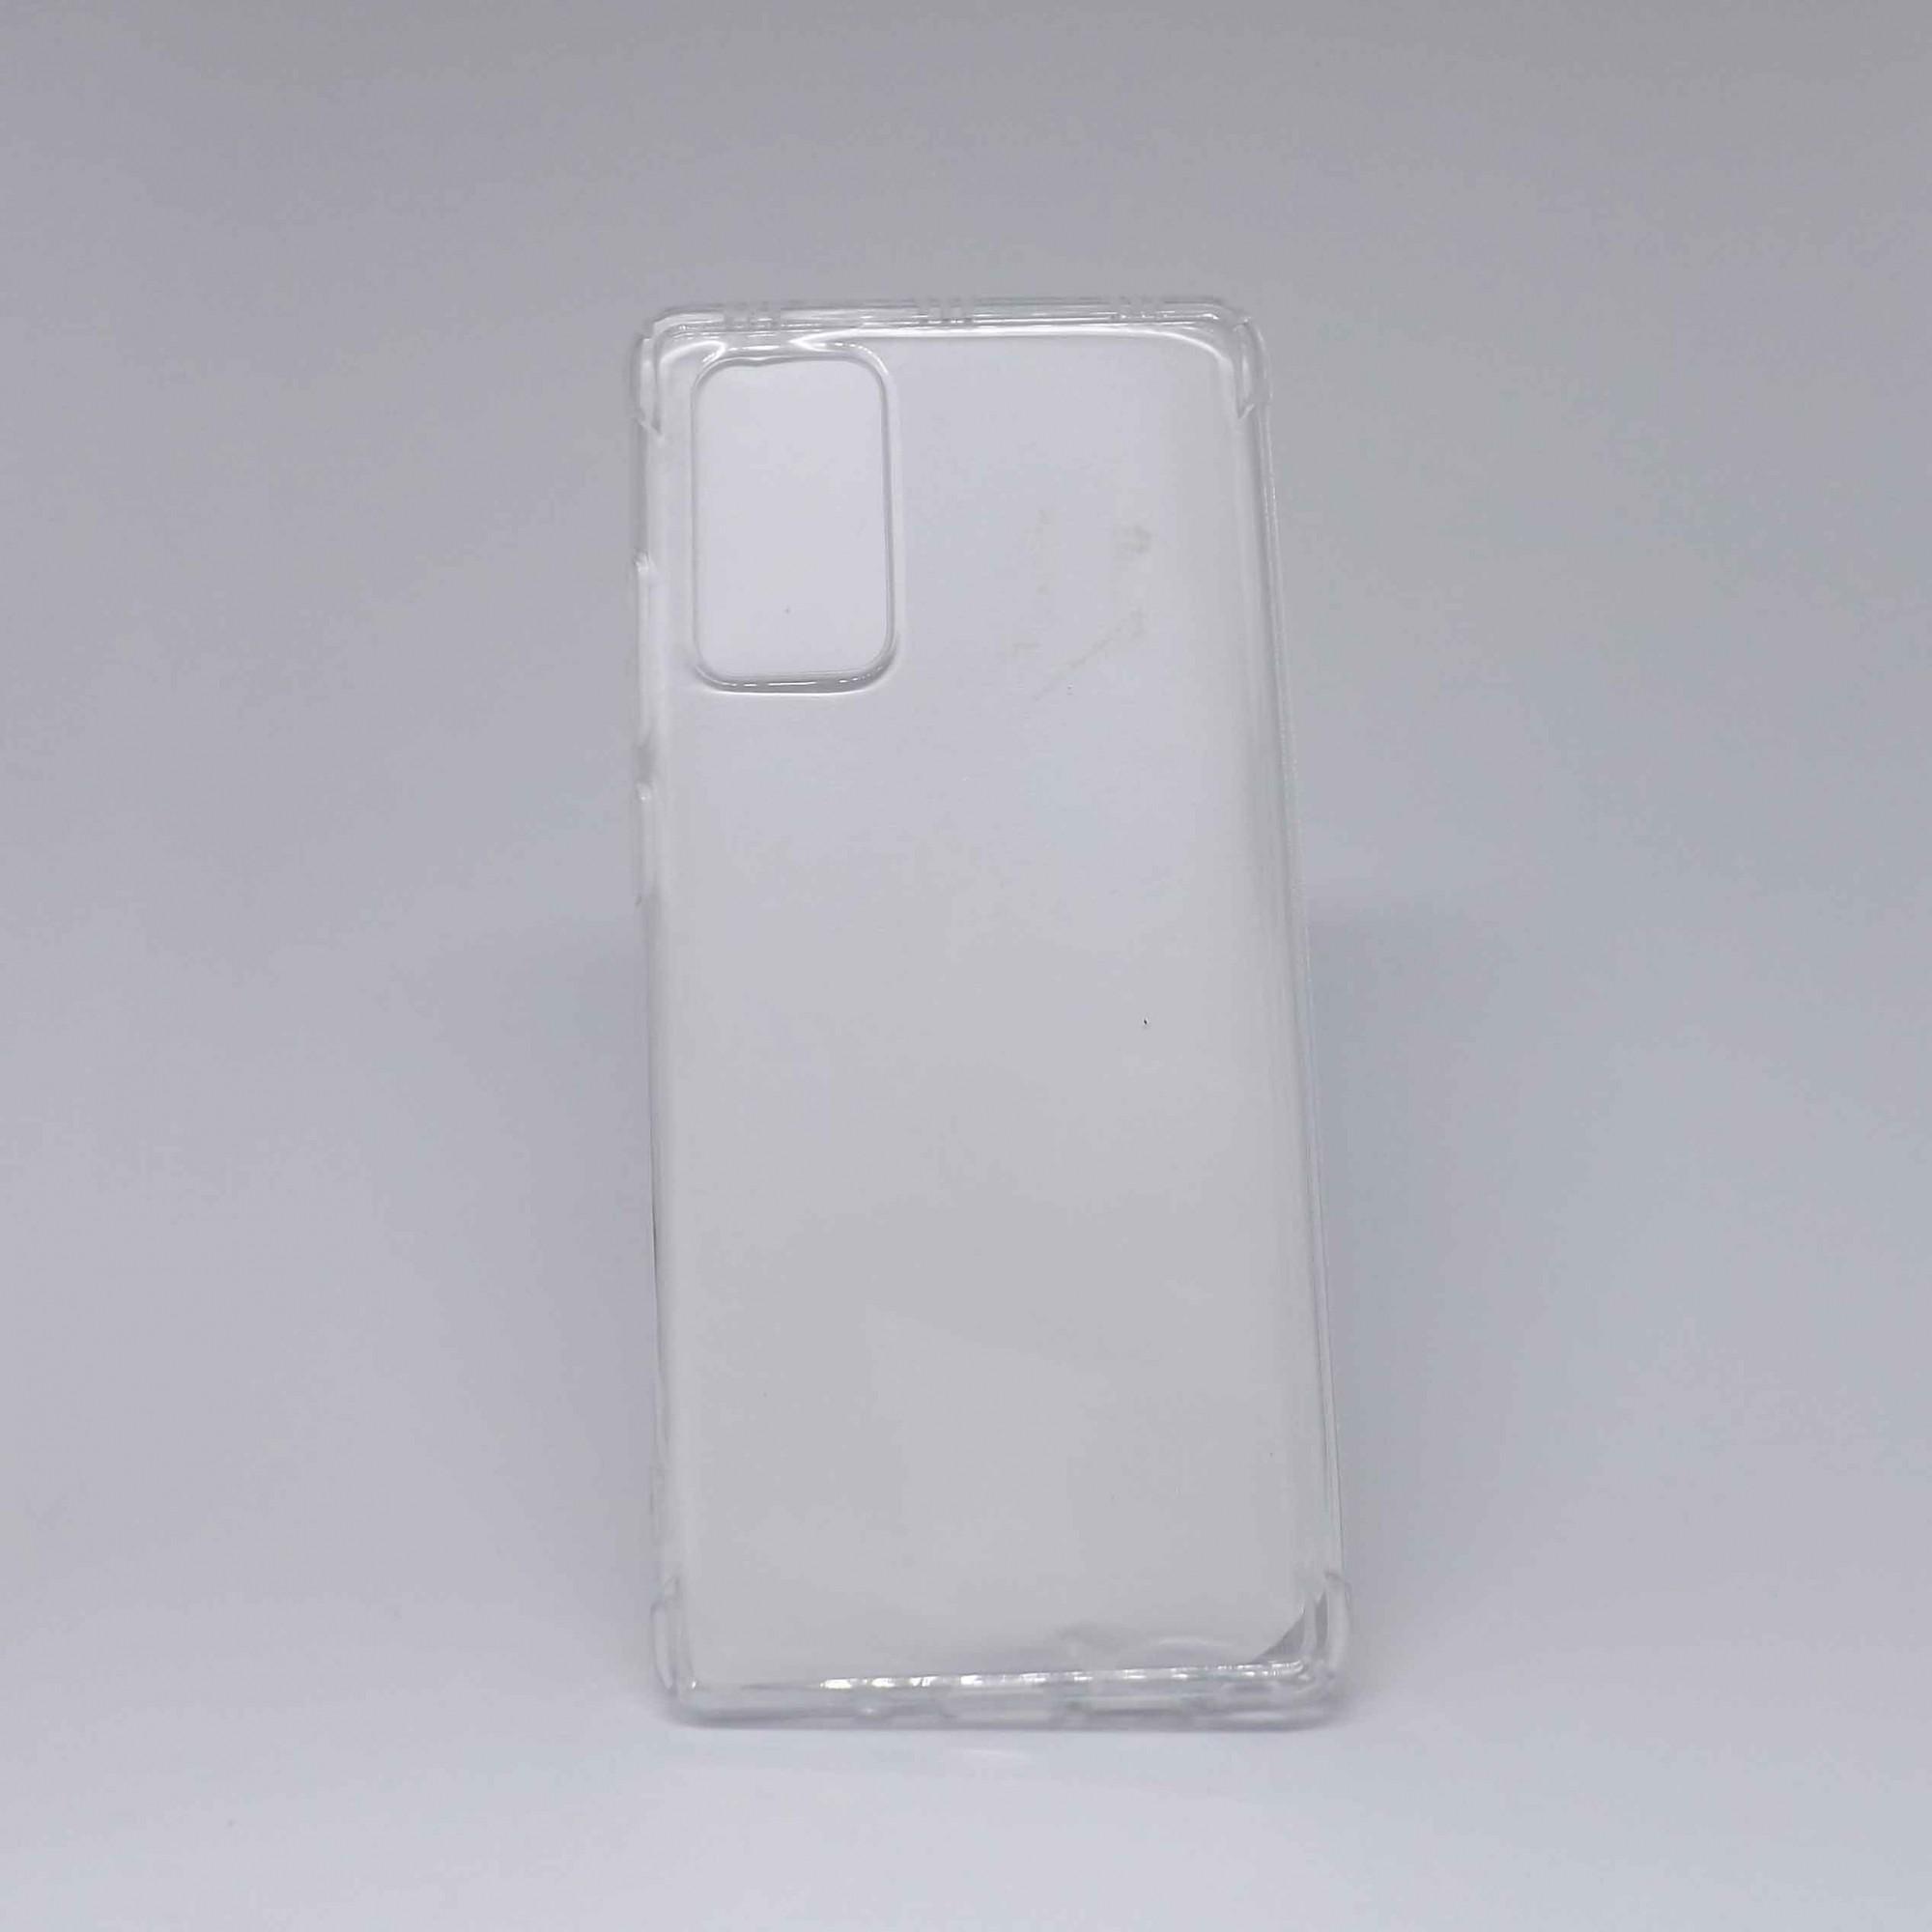 Capa Samsung Galaxy Note 20 Transparente